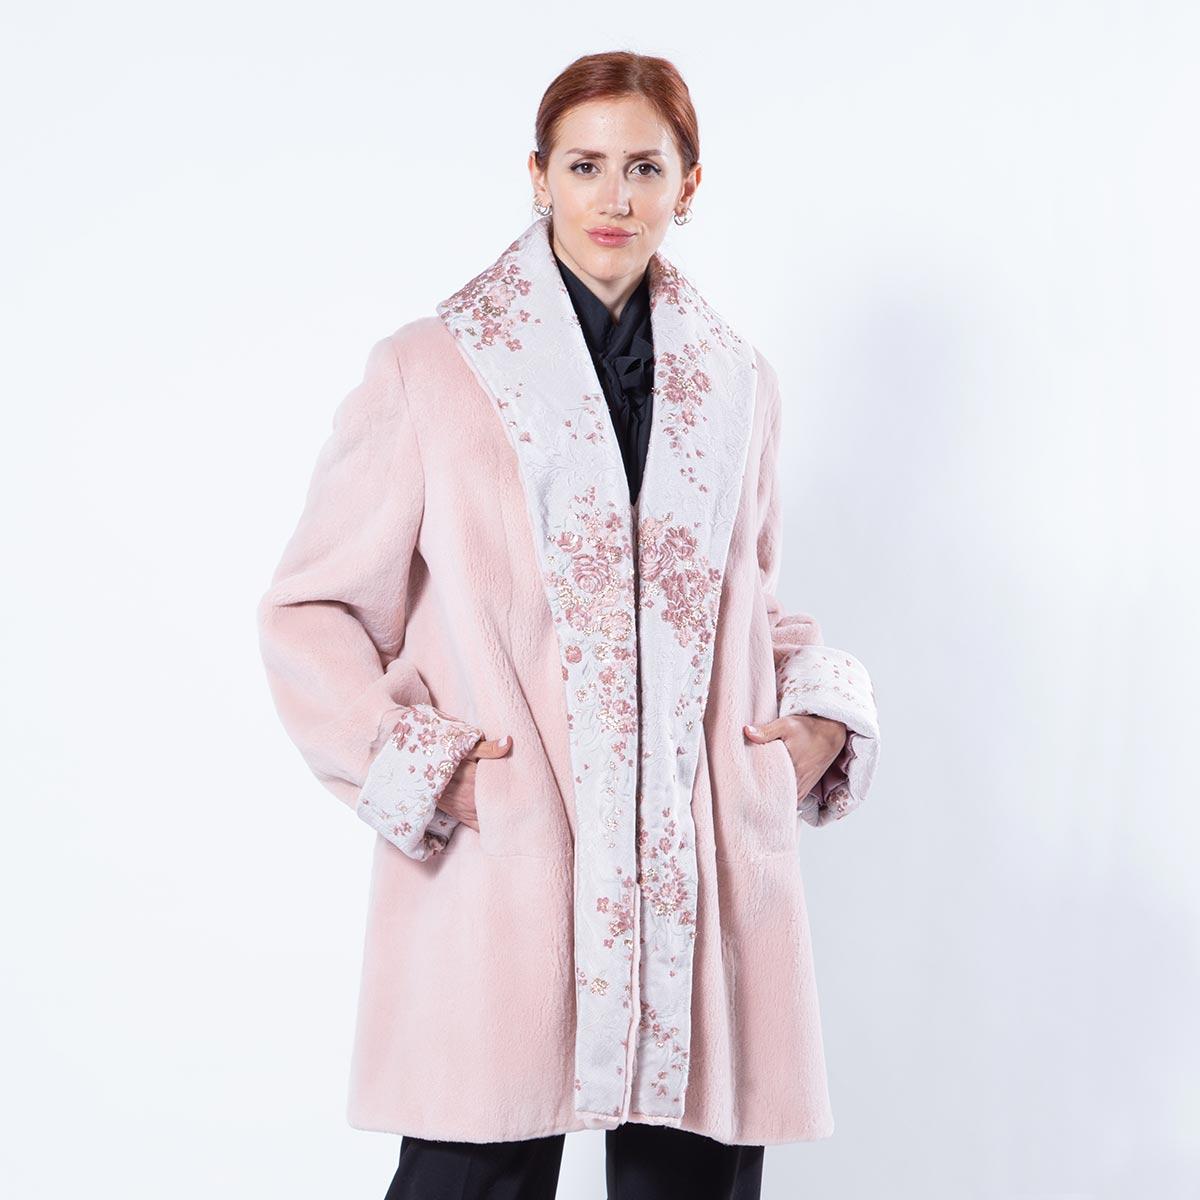 Antique Rose Sheared Mink and Fabric Jacket | Sarigianni Furs